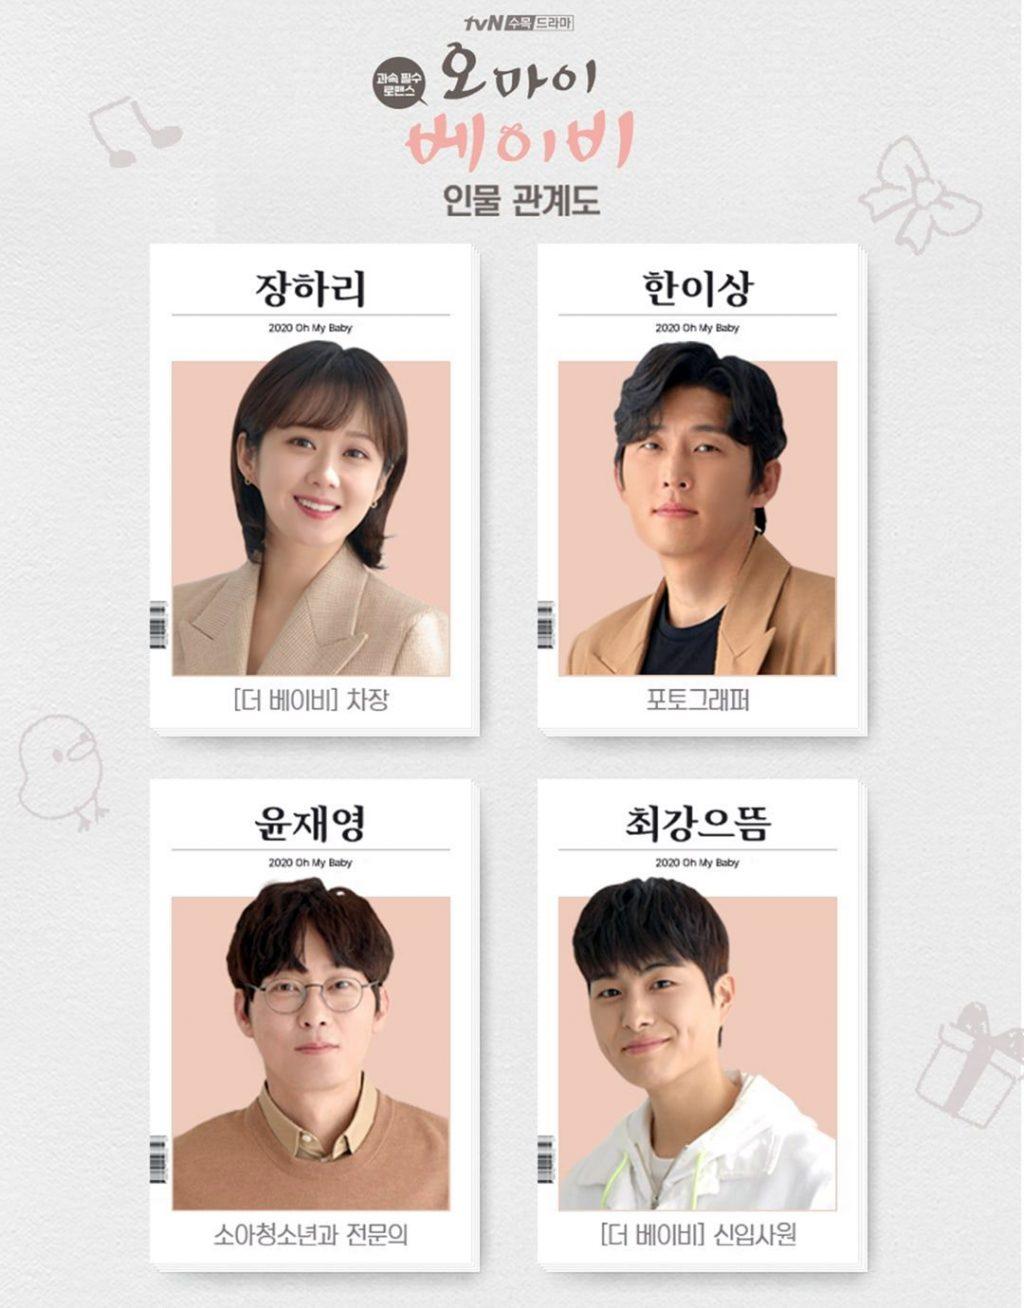 Pemeran K Drama Oh My Baby 1